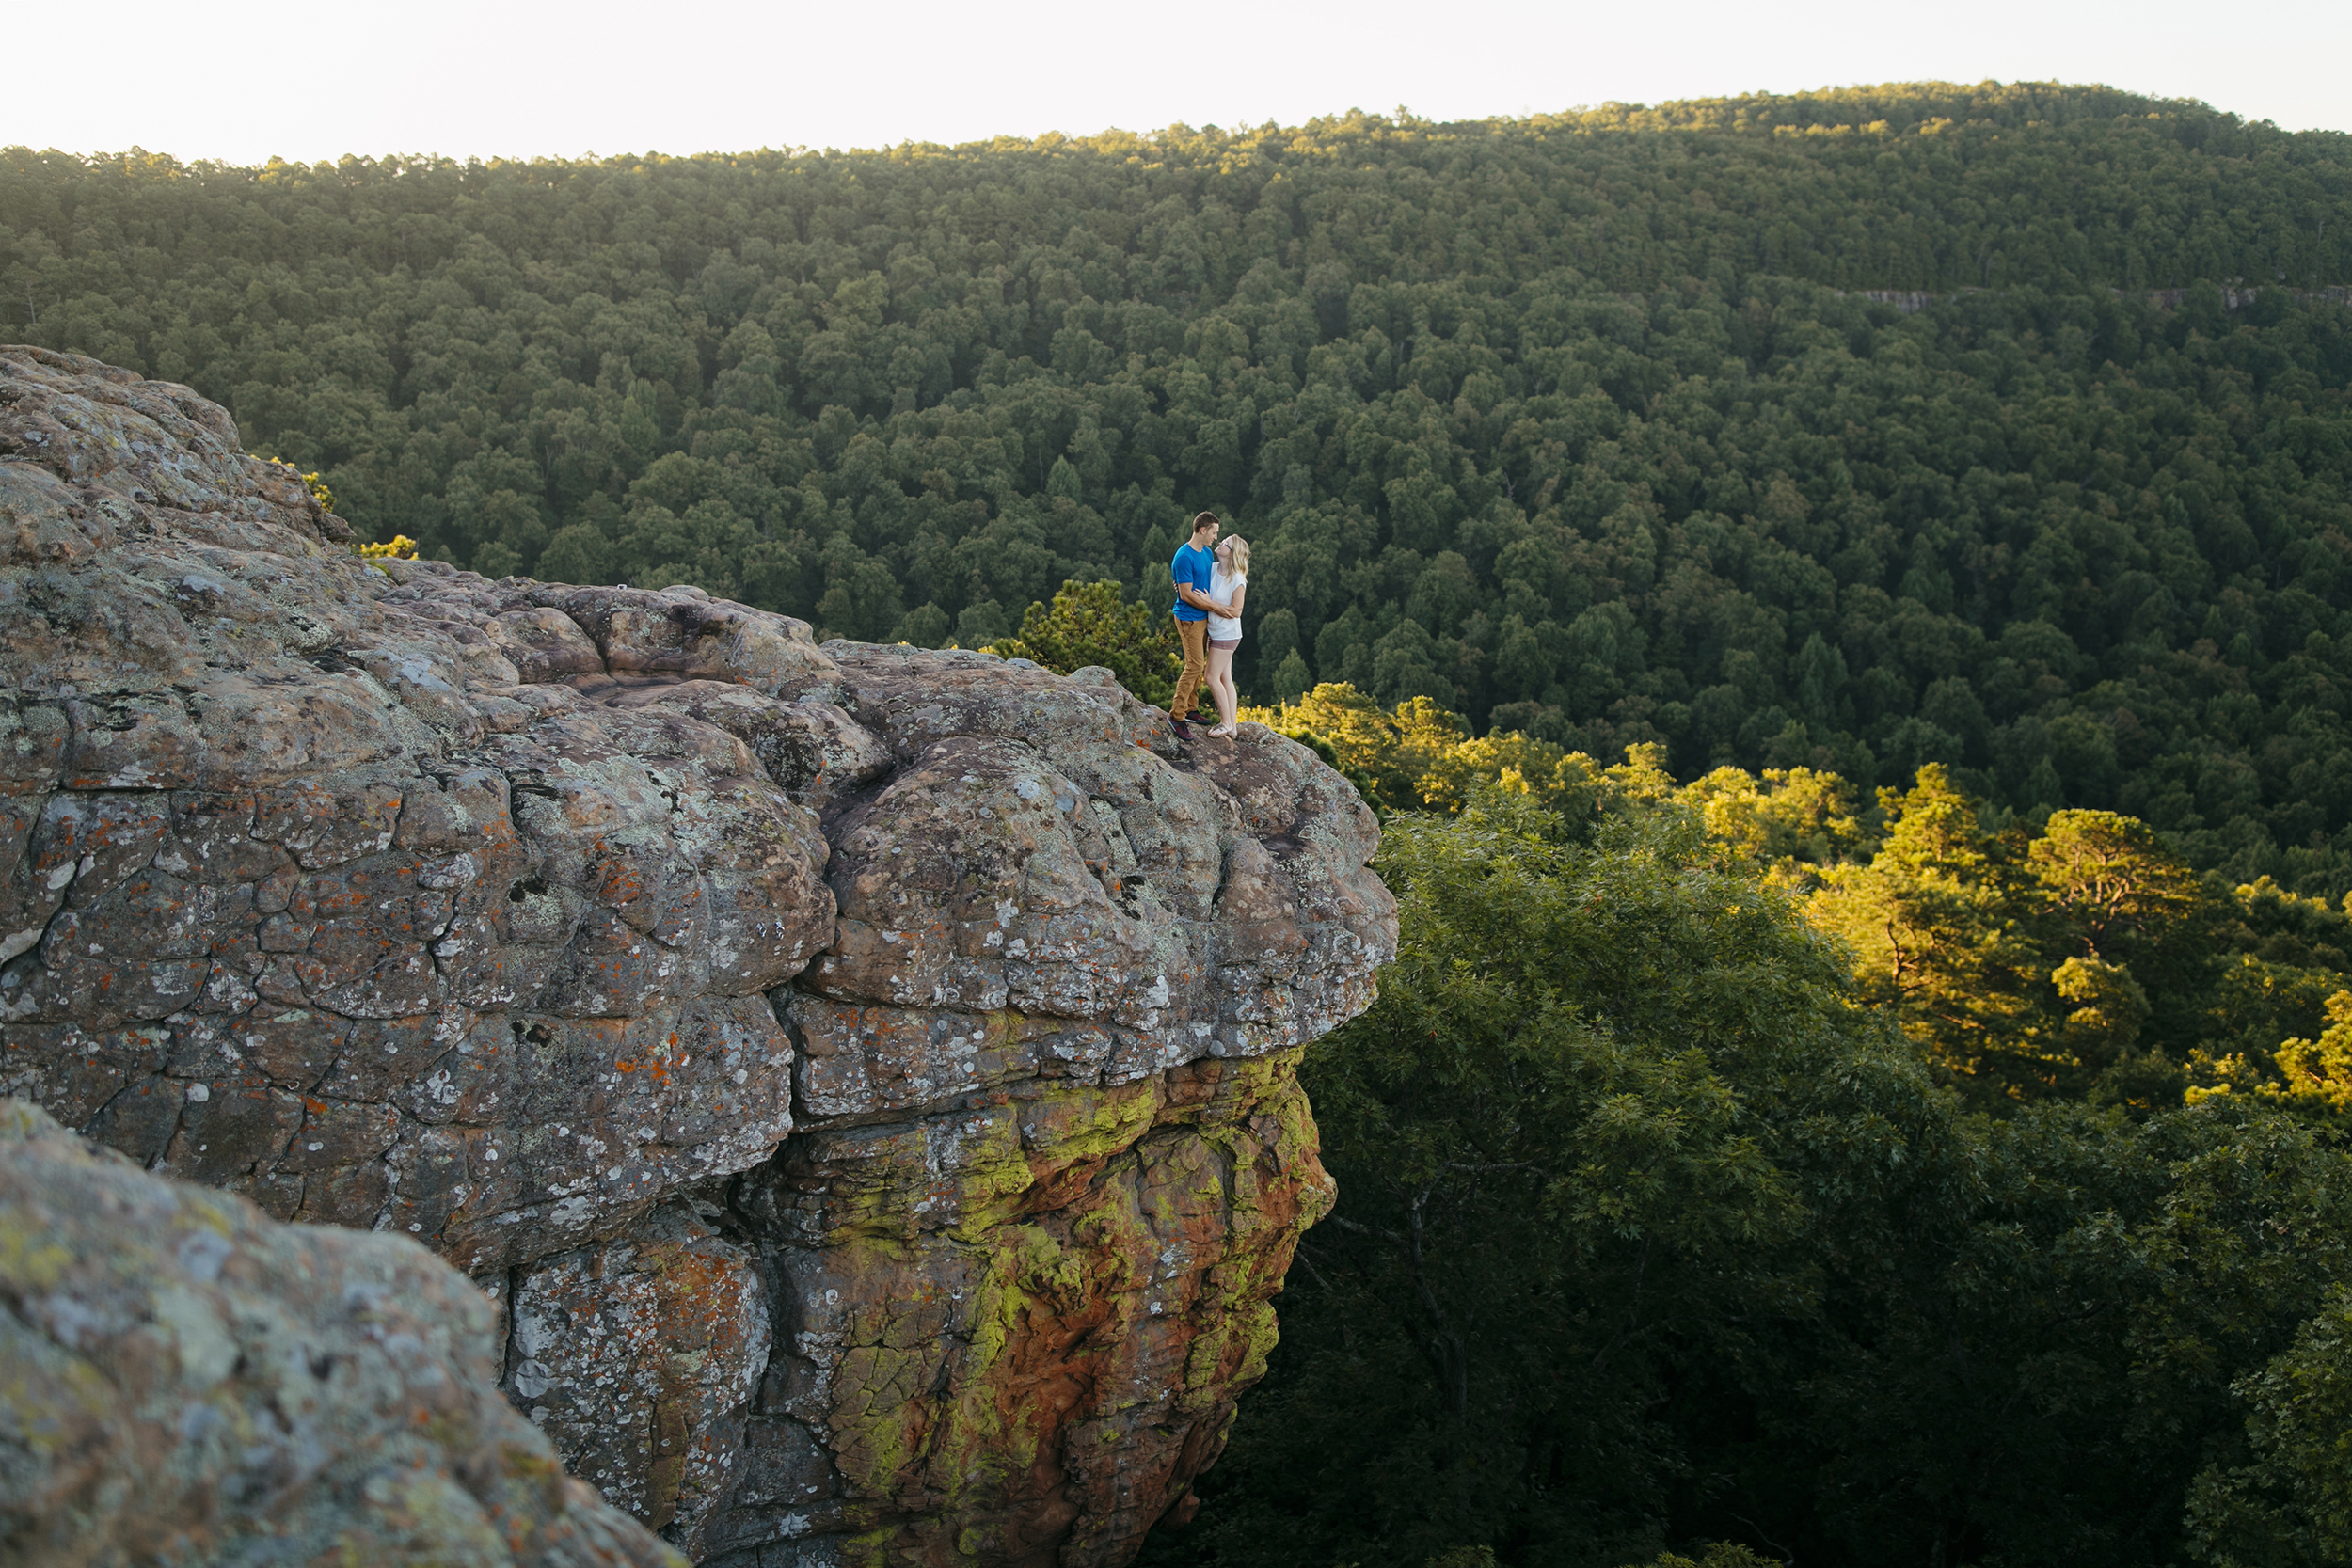 Buffalo-River-Arkansas-Sams-Throne-Adventure-Engagement-Photographer48.JPG